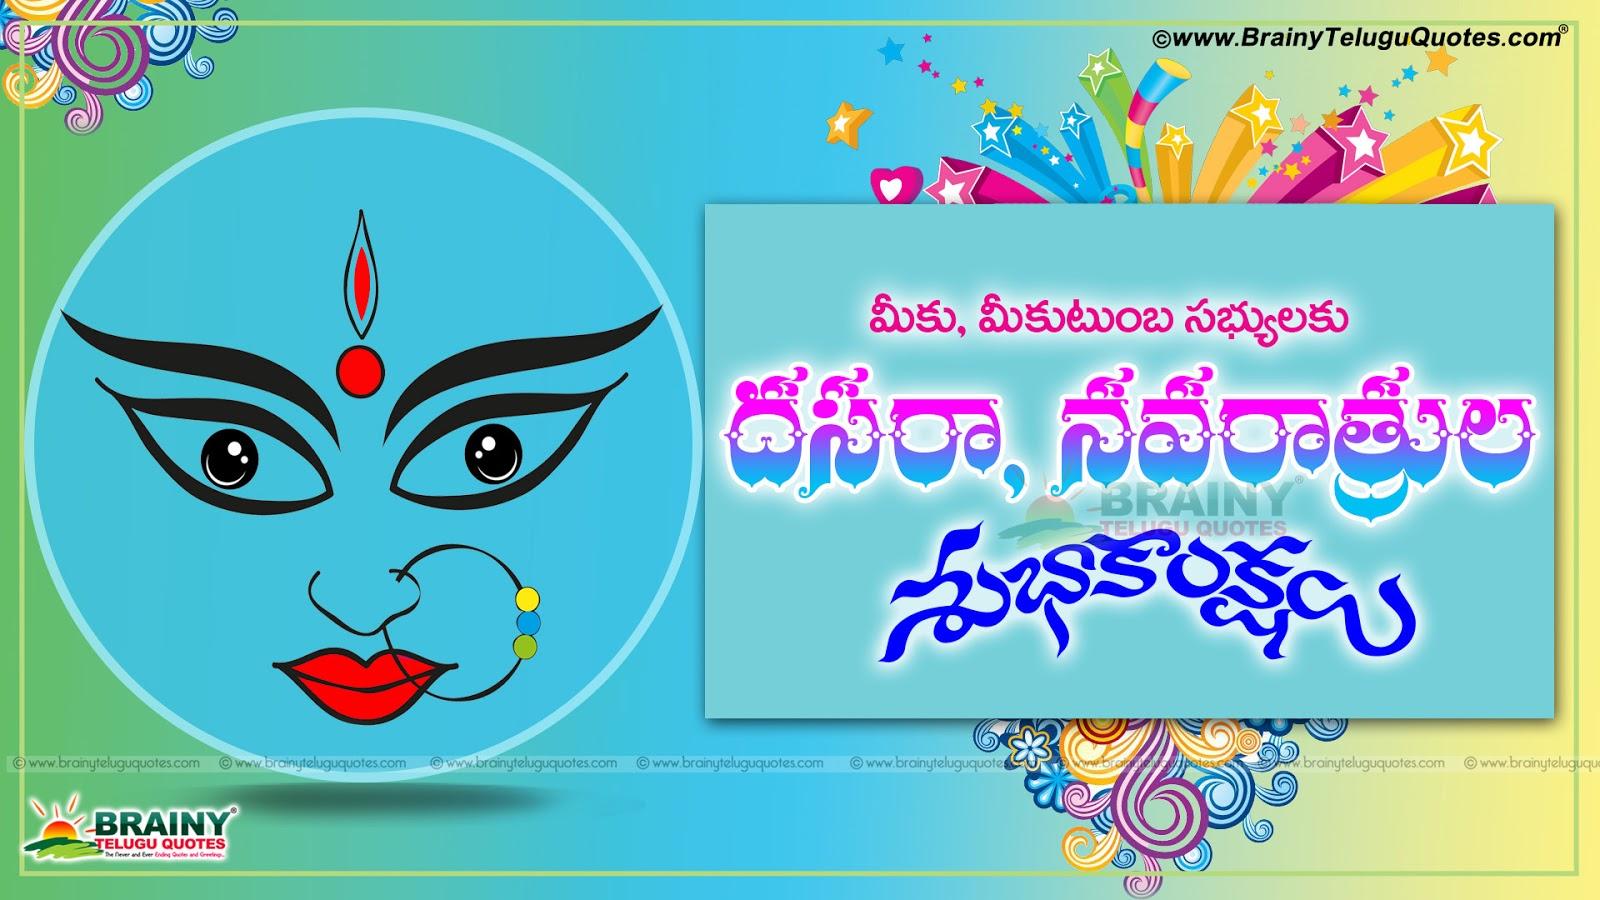 Dasara festival 2016 images in telugu labzada wallpaper dussehra greetings vijayadashami greetings in telugu source happy dasara telugu wishes quotations nice sms greetings with durga m4hsunfo